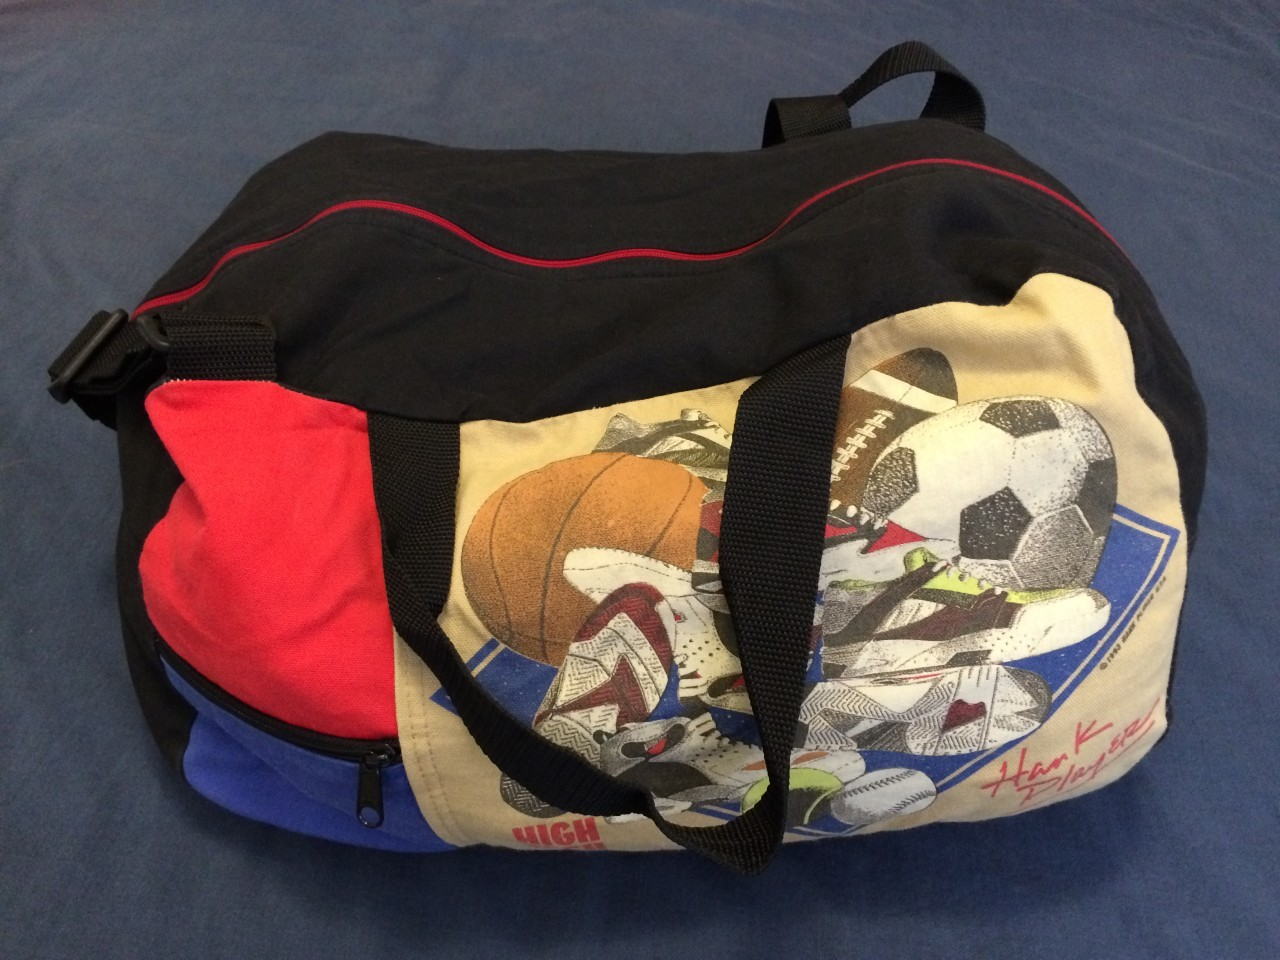 Beat up old duffel bag